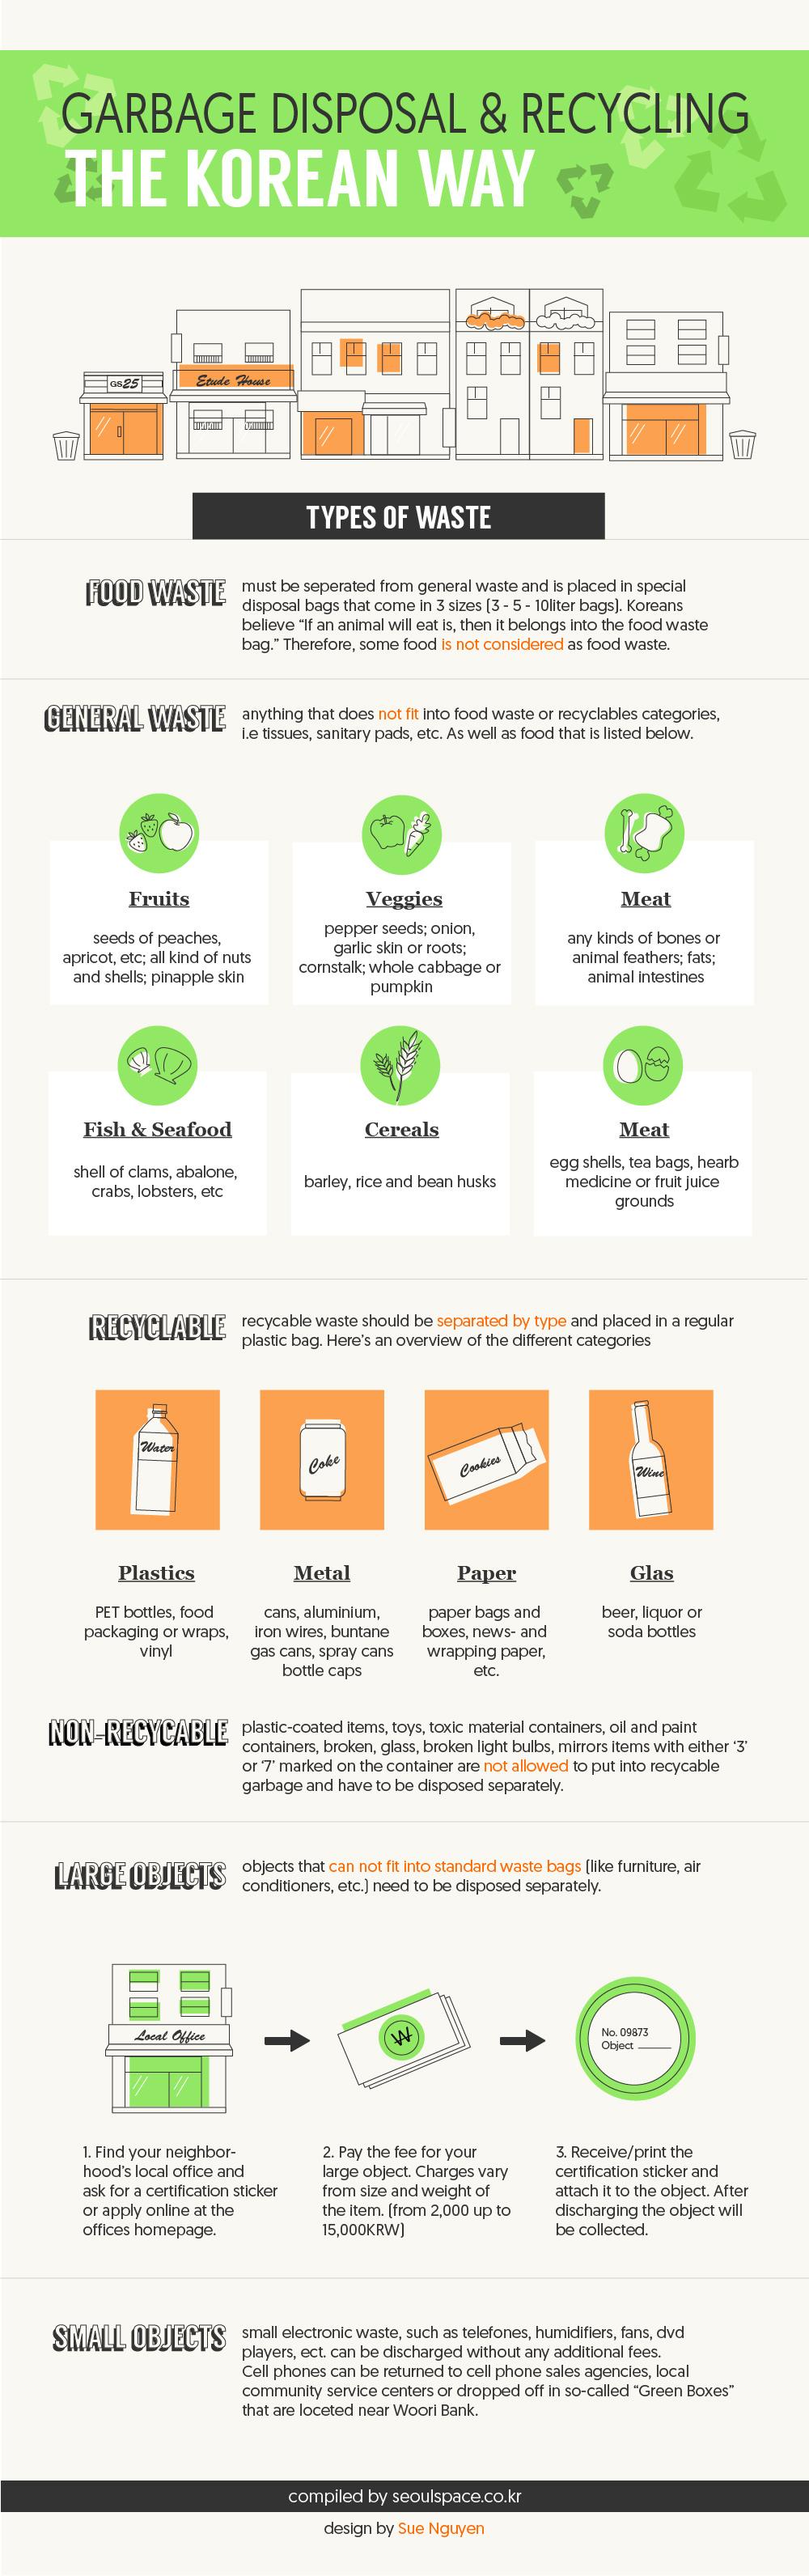 WasteDisposal  Infographic    Waste Disposal